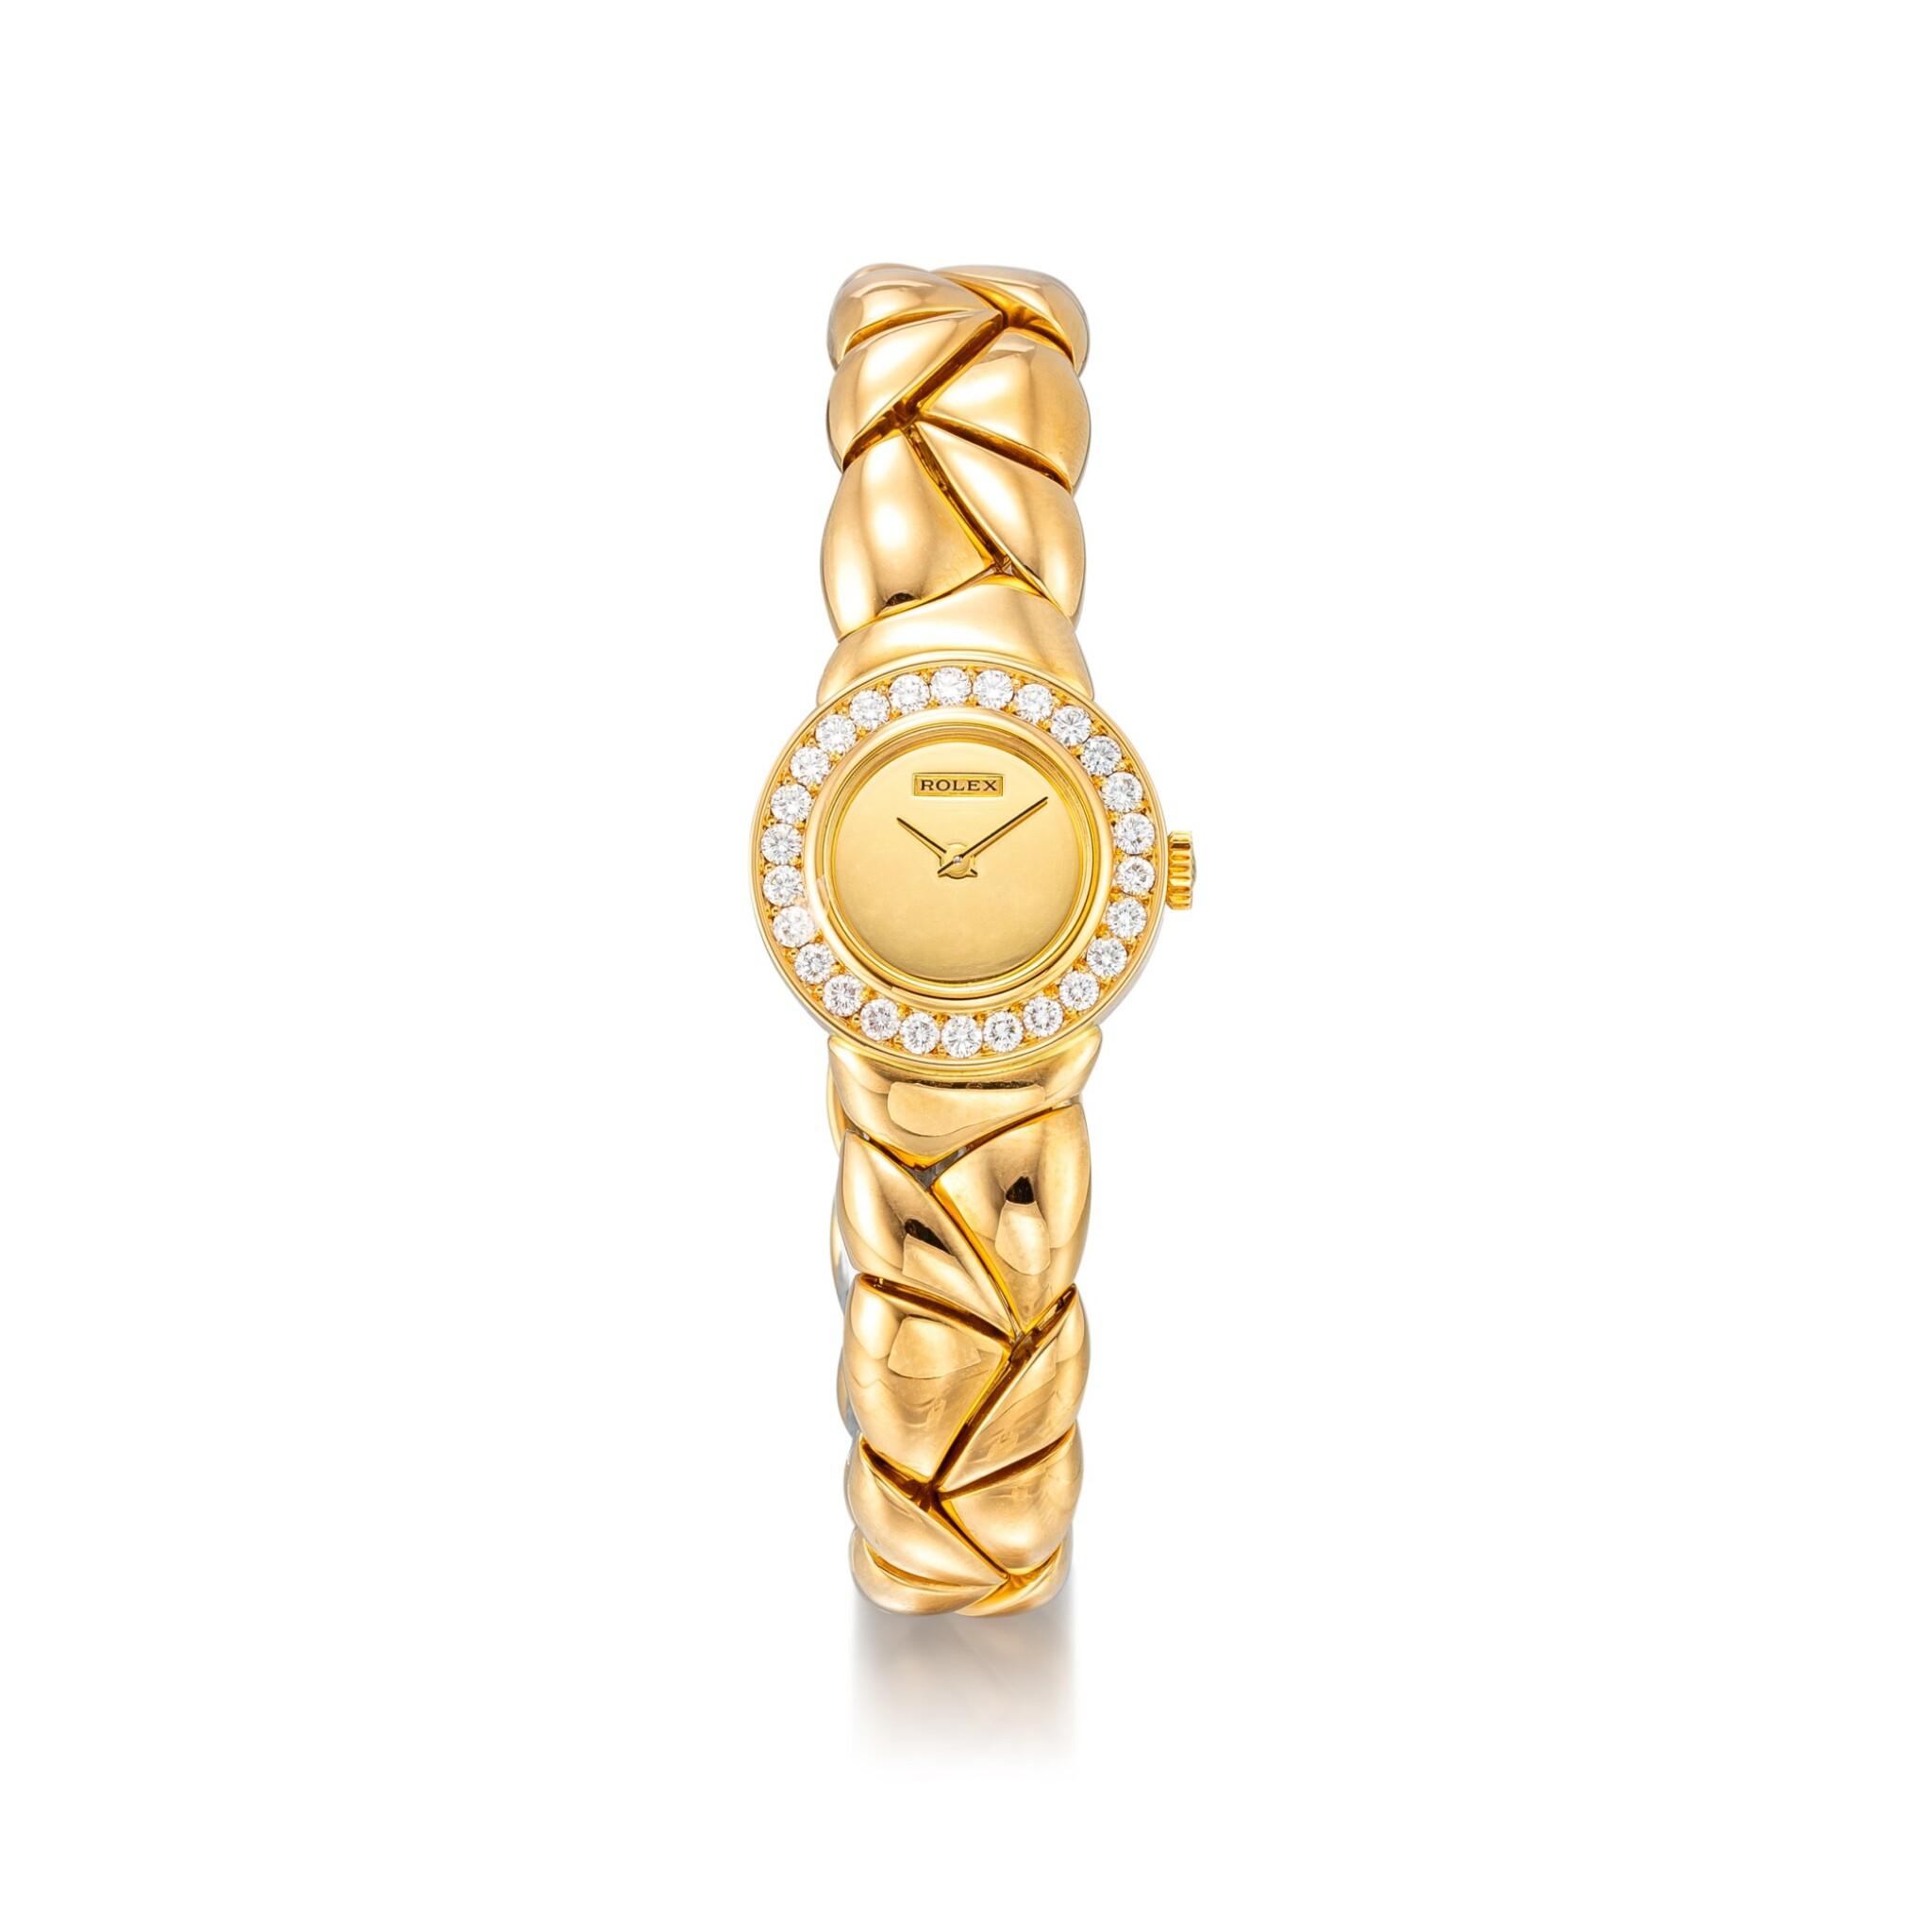 View full screen - View 1 of Lot 8164. ROLEX | REFERENCE 2732 | A YELLOW GOLD AND DIAMOND-SET BRACELET WATCH, CIRCA 1990 |  勞力士 |  型號2732 黃金鑲鑽石鏈帶腕錶,約1990年製.